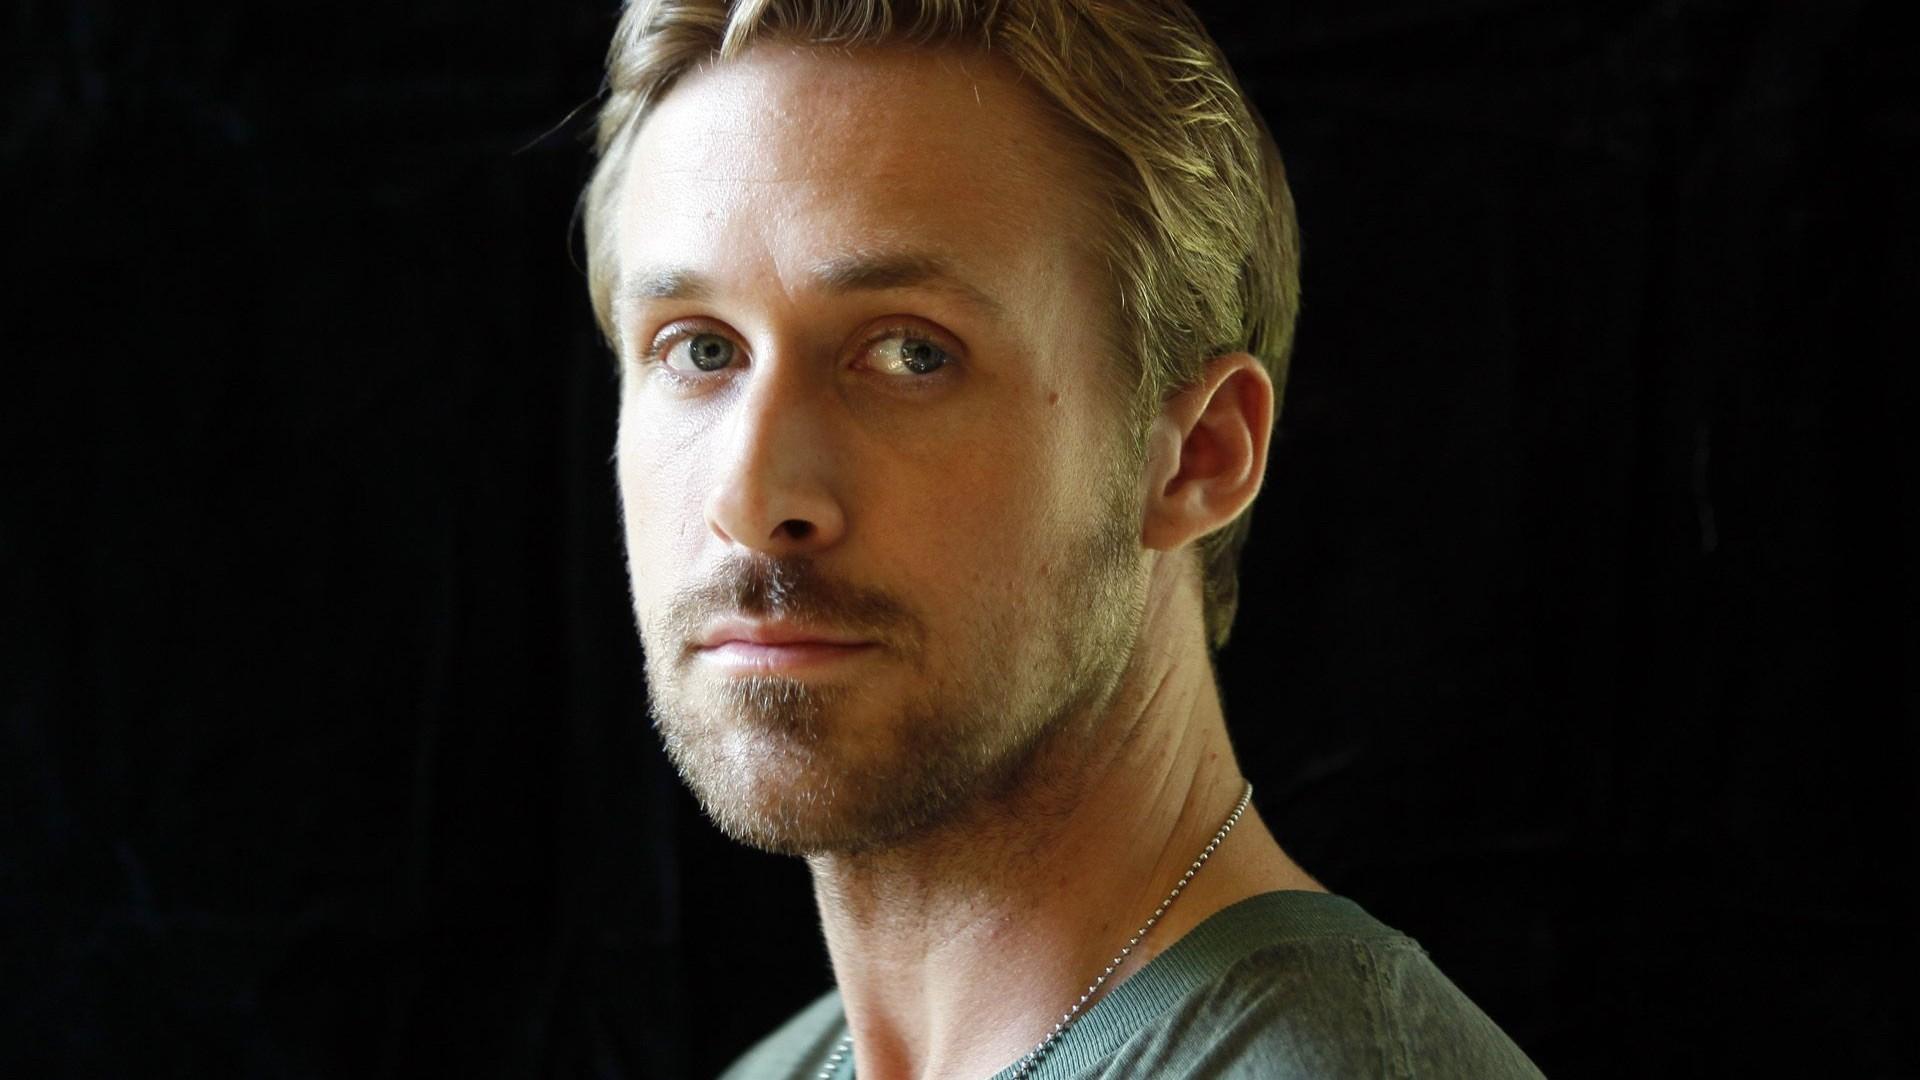 More Beautiful Ryan Gosling Wallpaper FLgrx Graphics 1920x1080